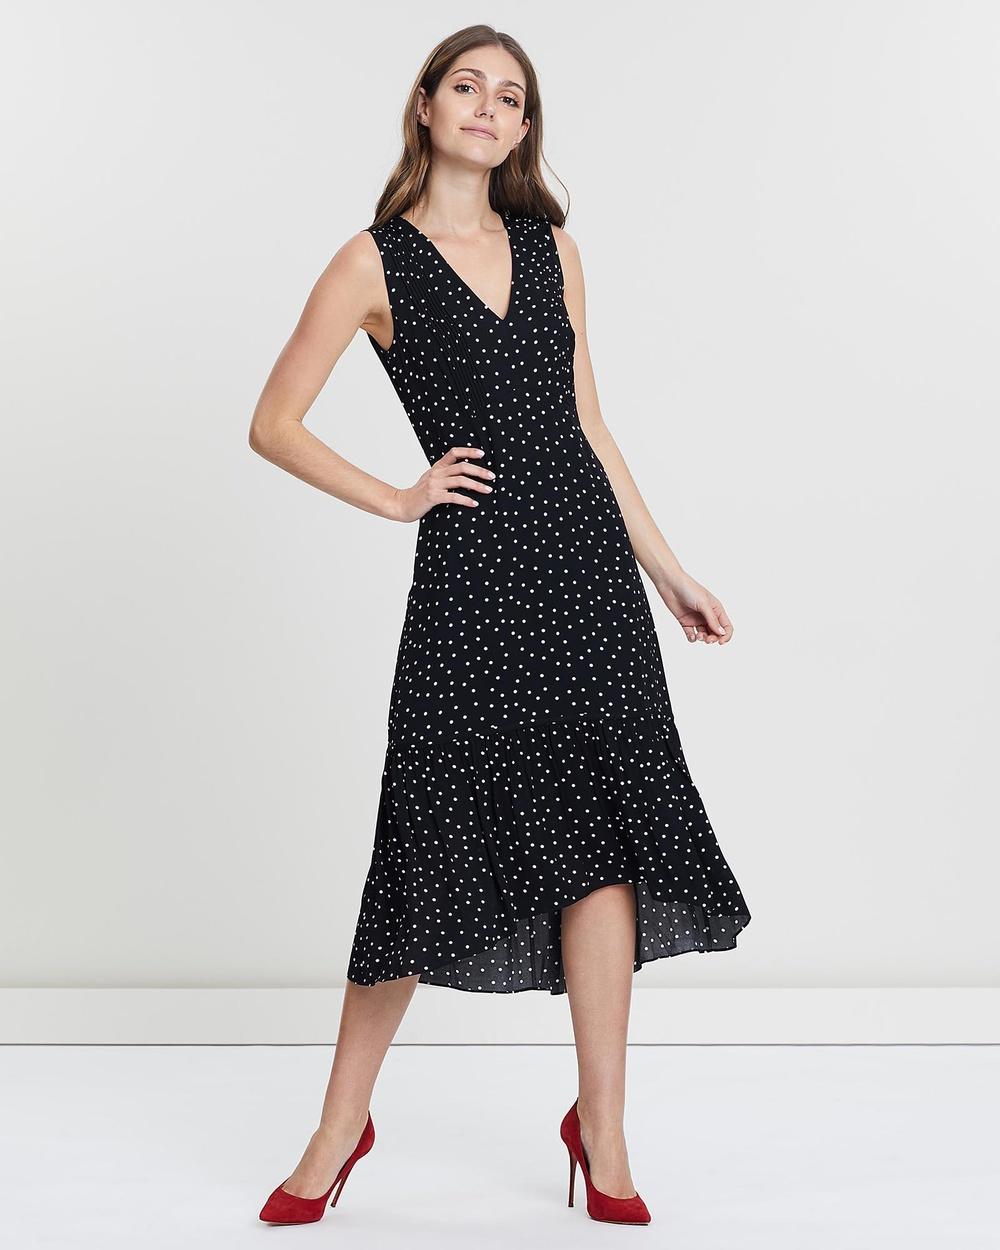 David Lawrence BLACK Sleeveless Pintuck Polka Dot Dress